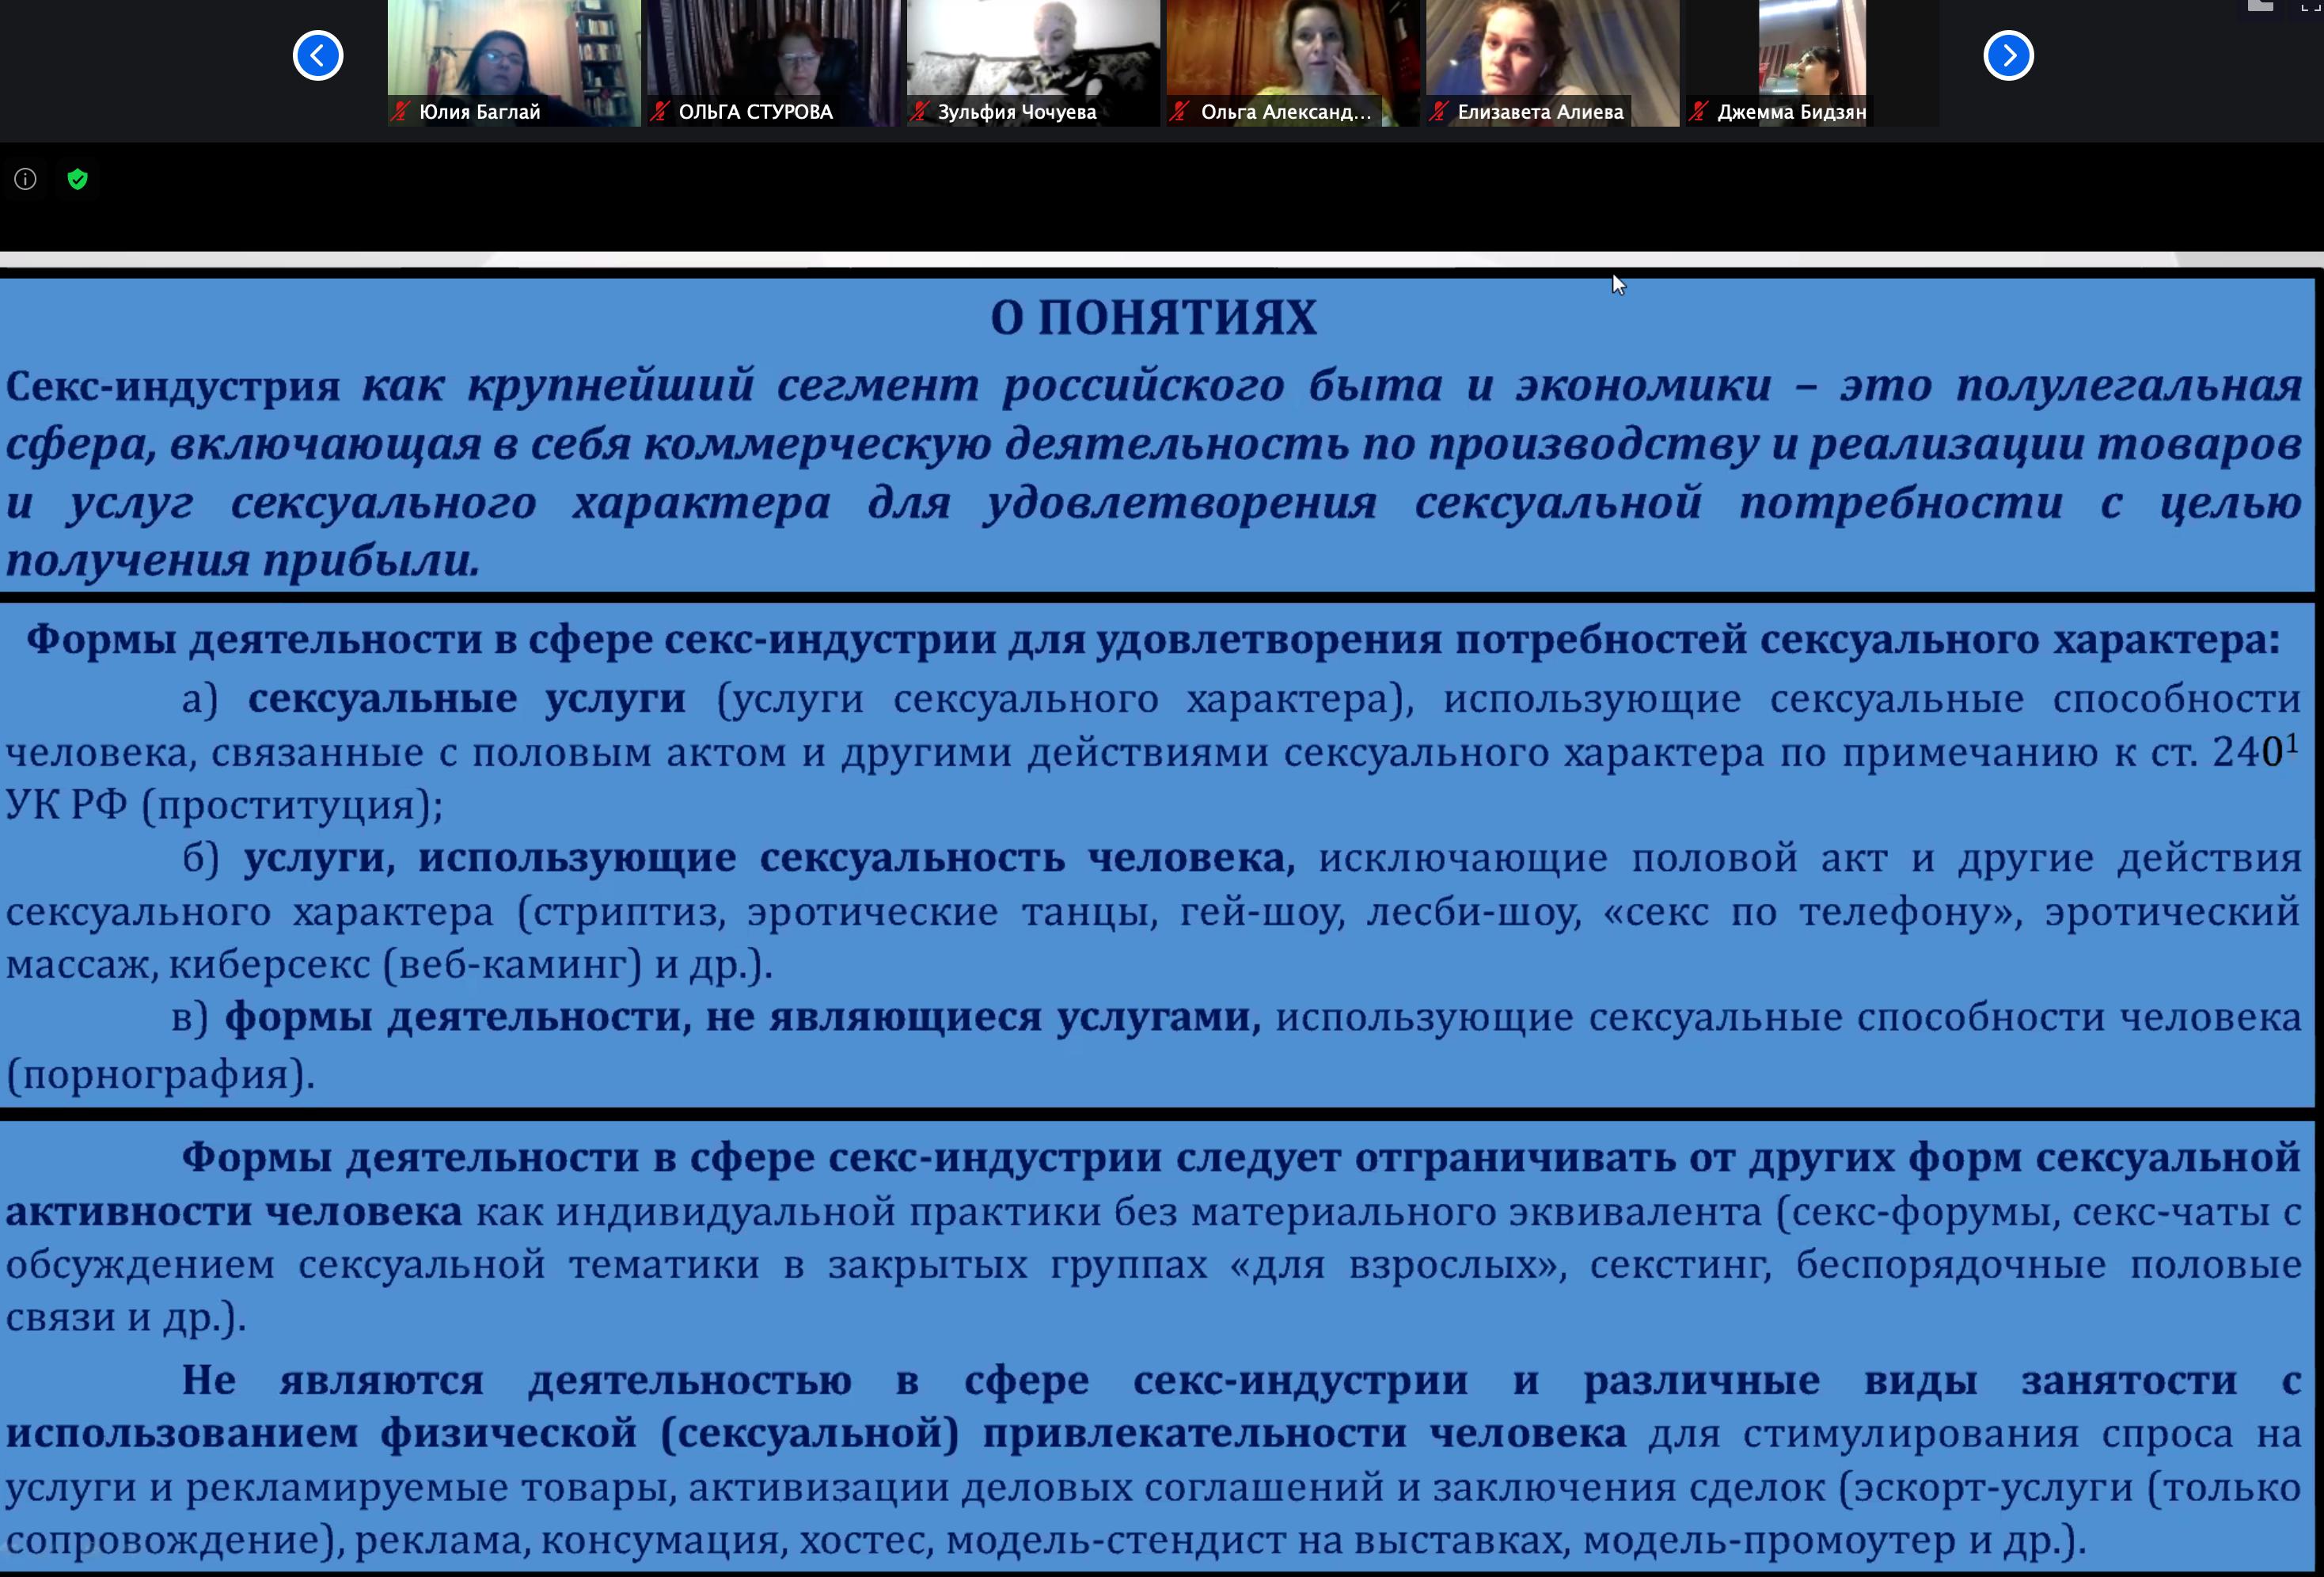 Снимок экрана 2020-12-23 в 17.36.46